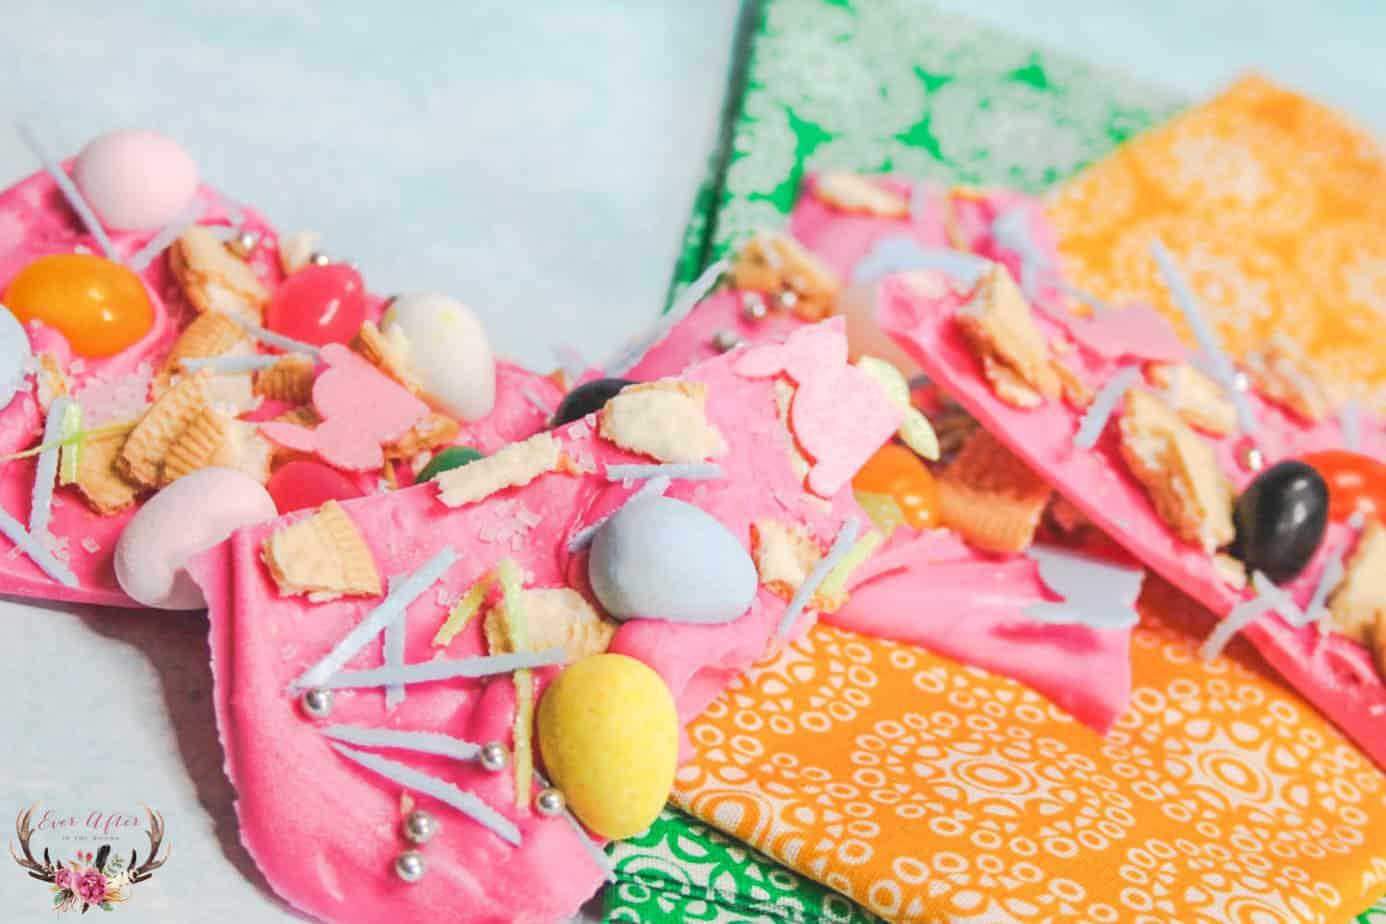 pink bunny bark | chocolate bark | pink chocolate bark